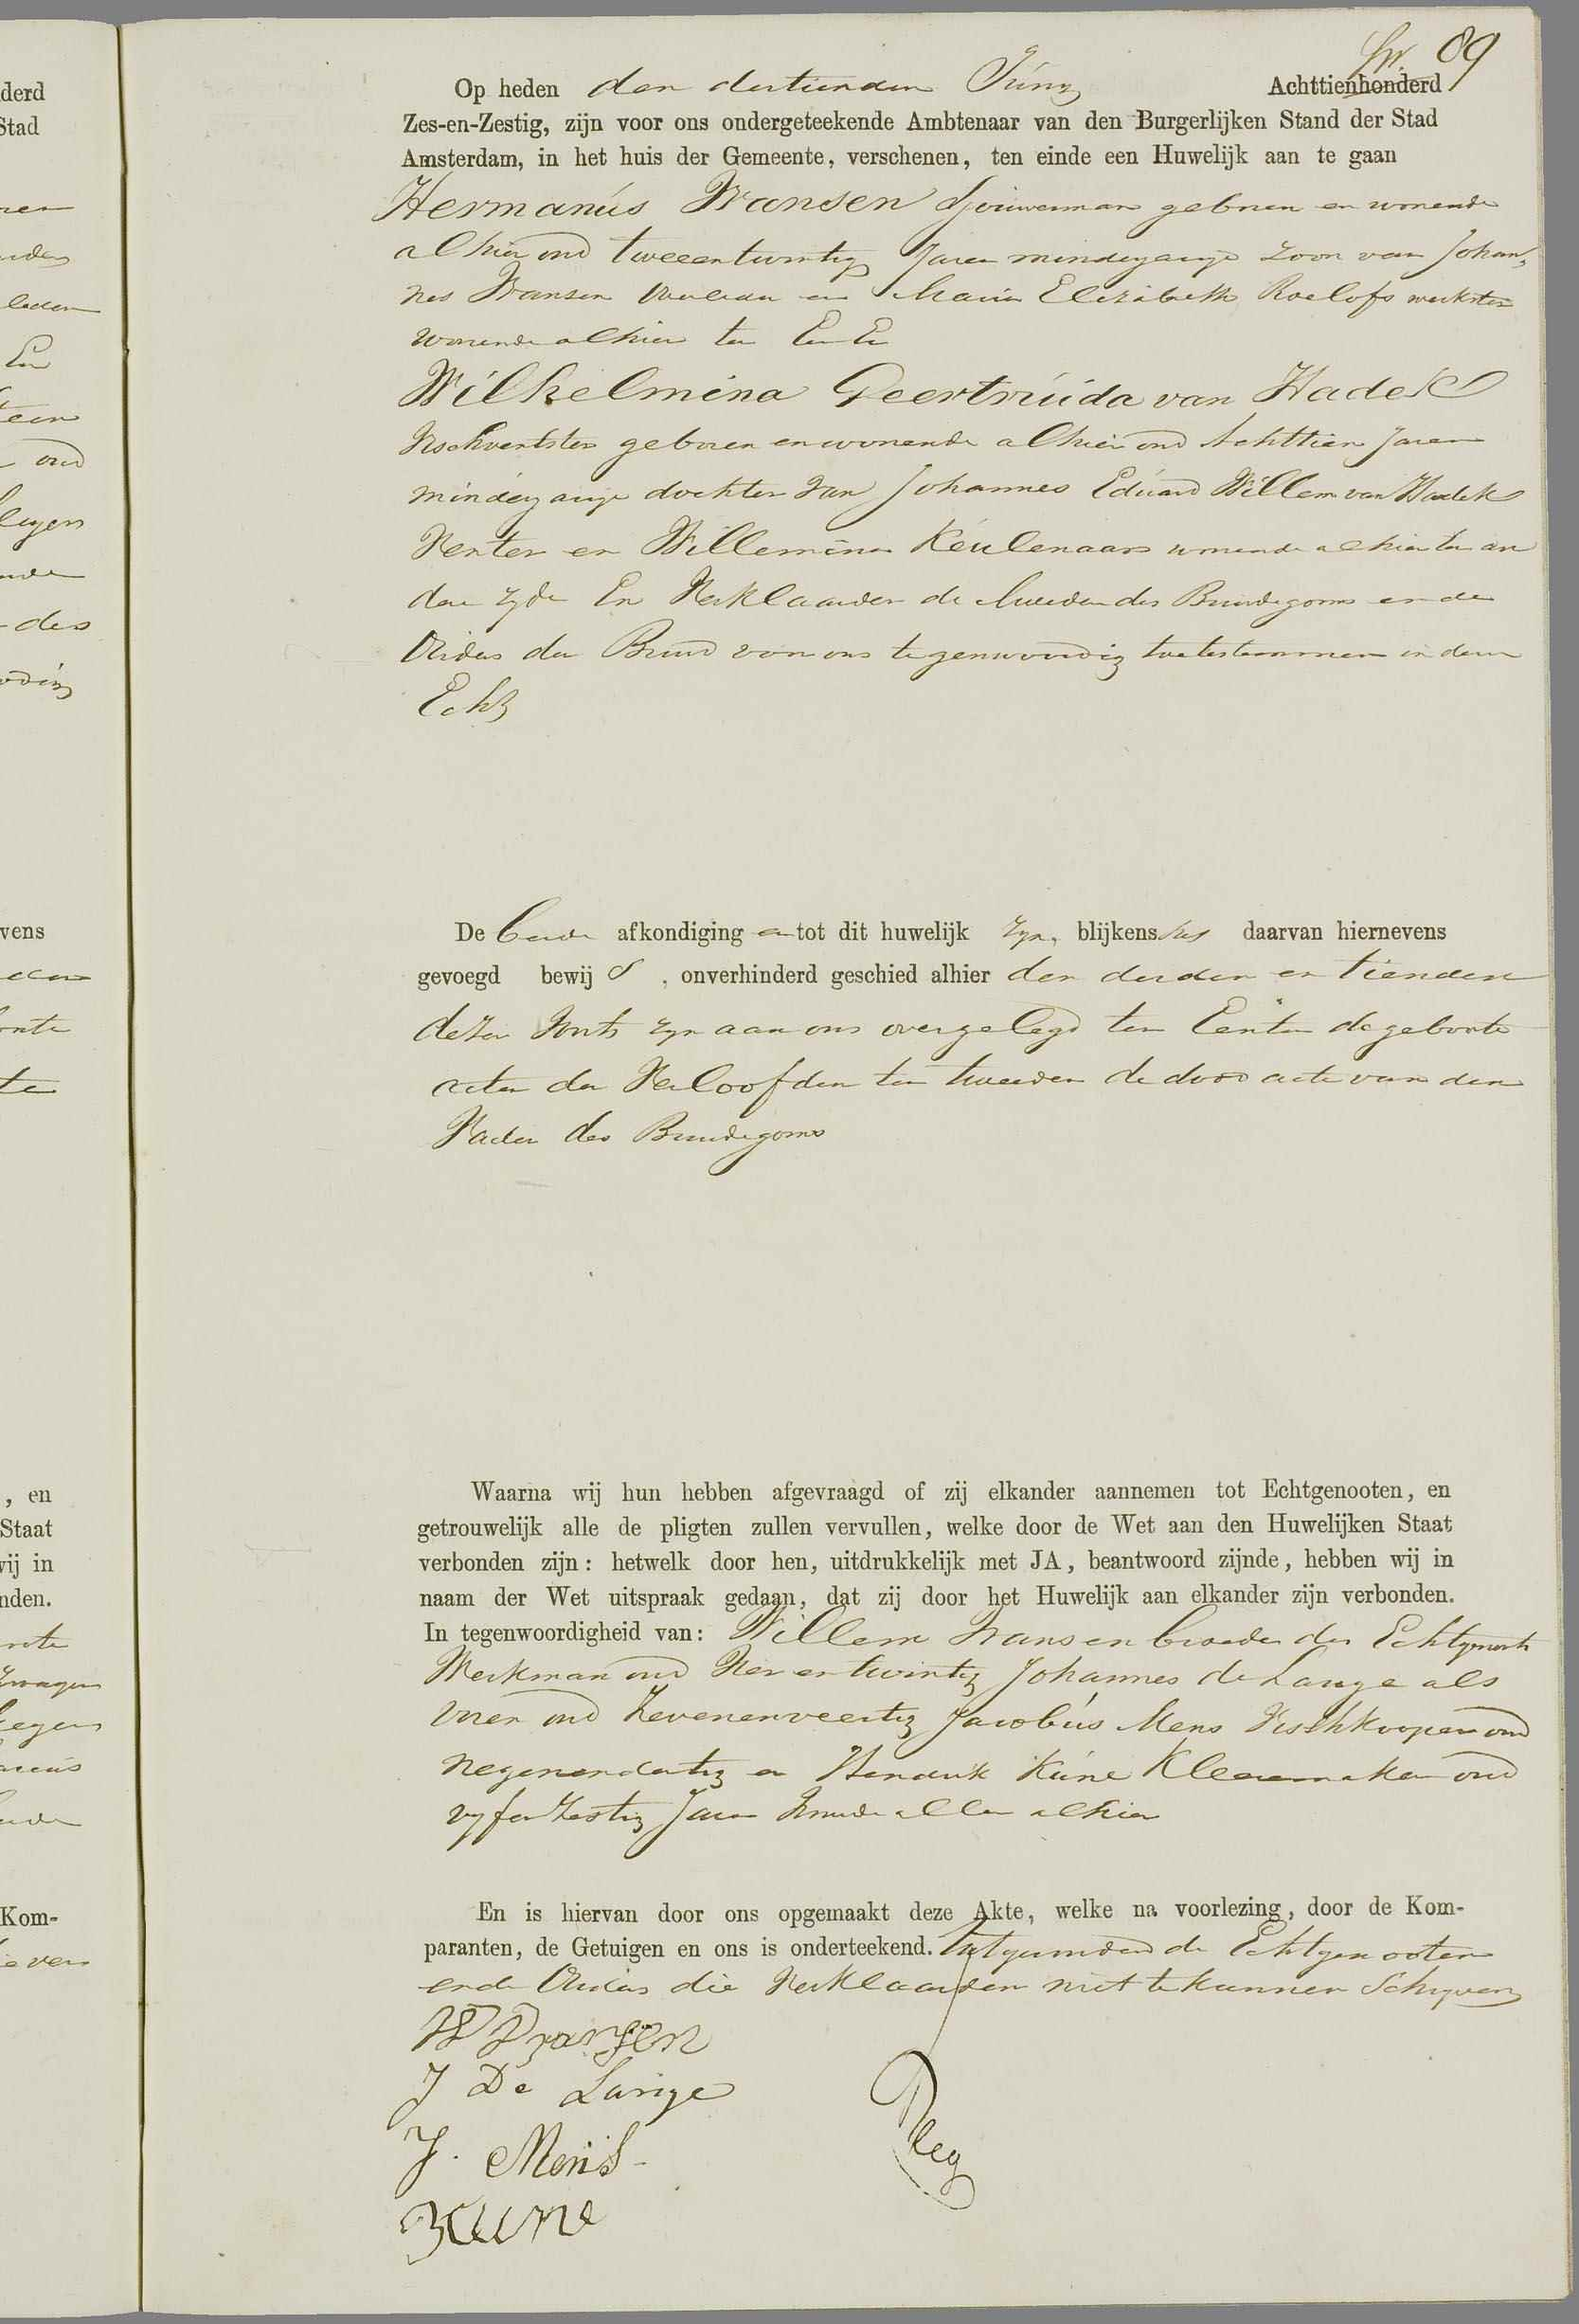 handtekening voorouders